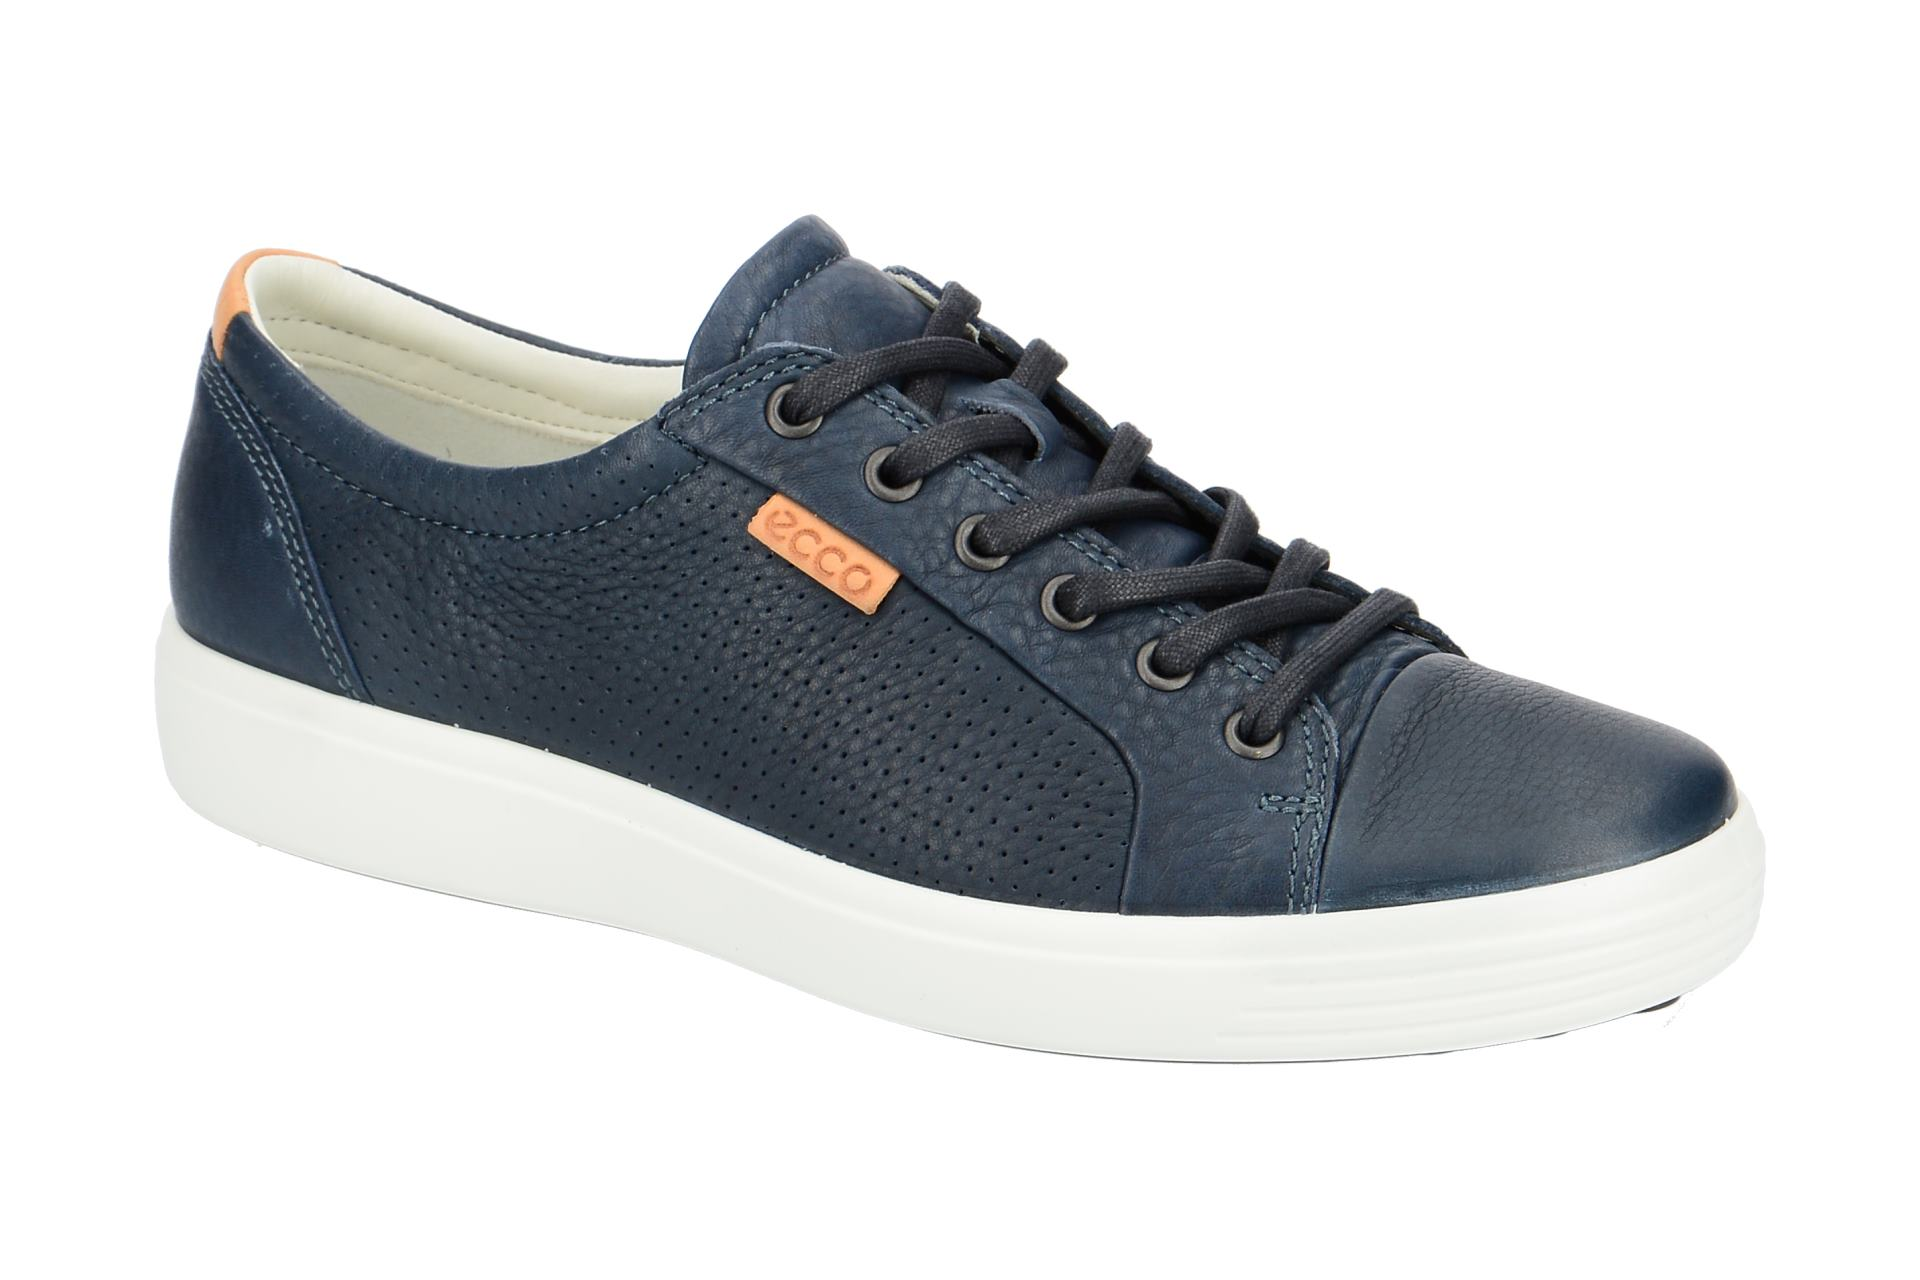 adabfa17904ae0 Ecco Schuhe Sneaker Soft 7 blau weiß - Schuhhaus Strauch Shop